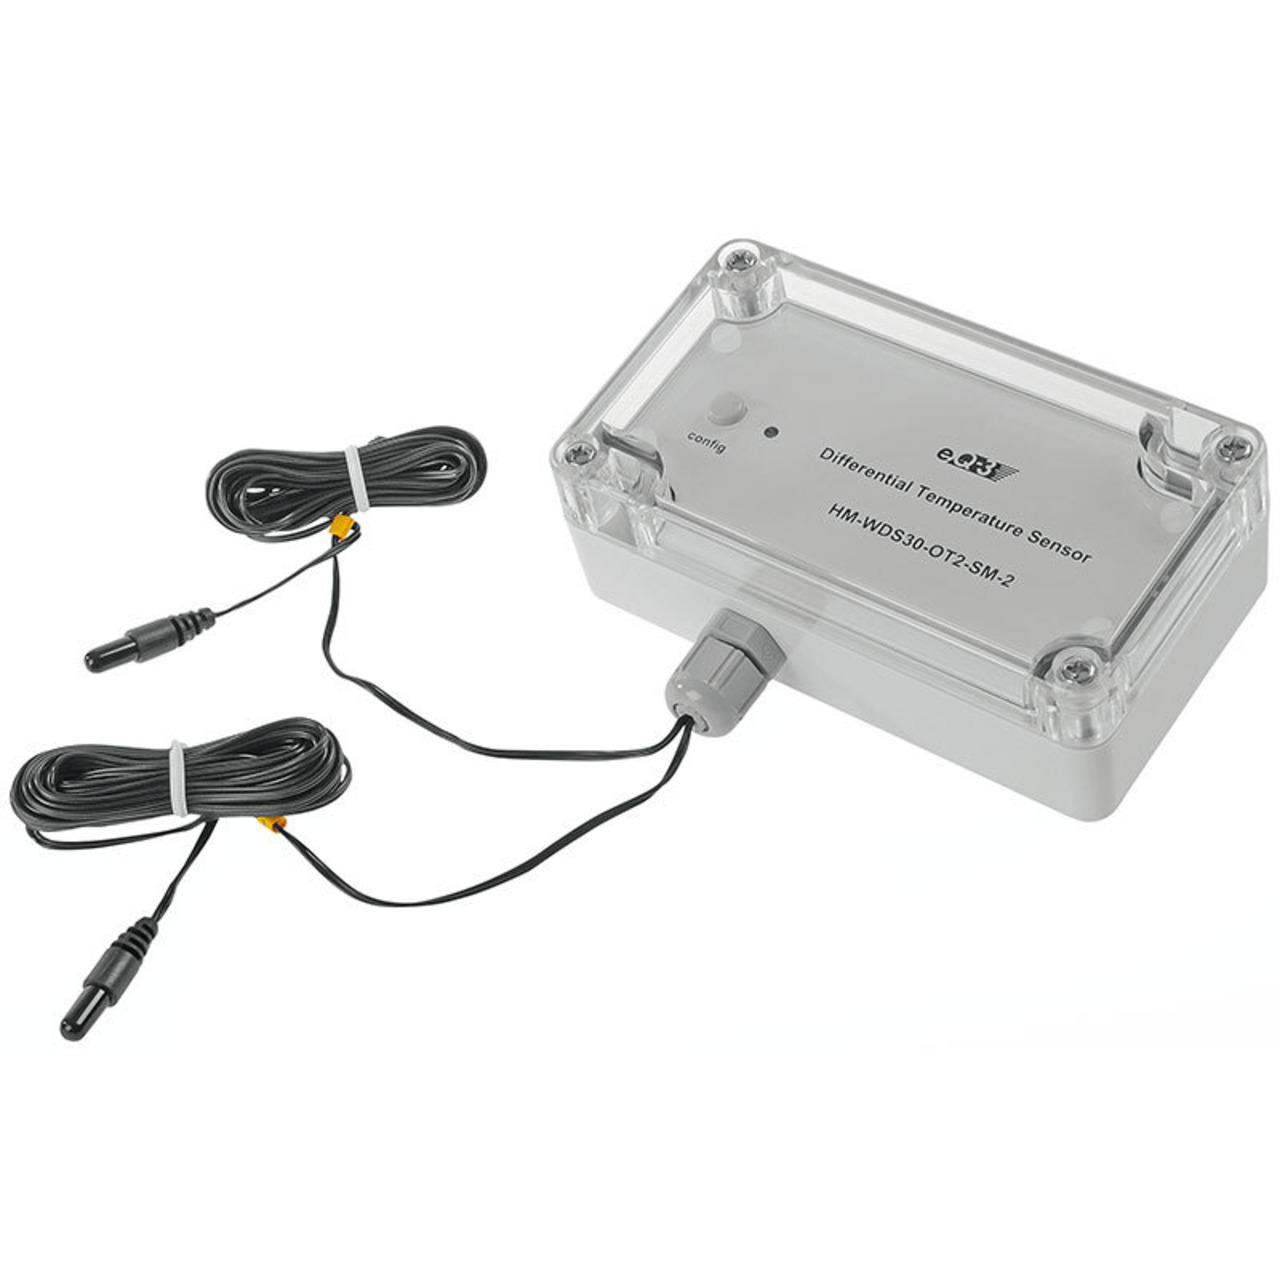 Homematic Differenz-Temperatur-Sensor HM-WDS30-OT2-SM-2 für Smart Home - Hausautomation